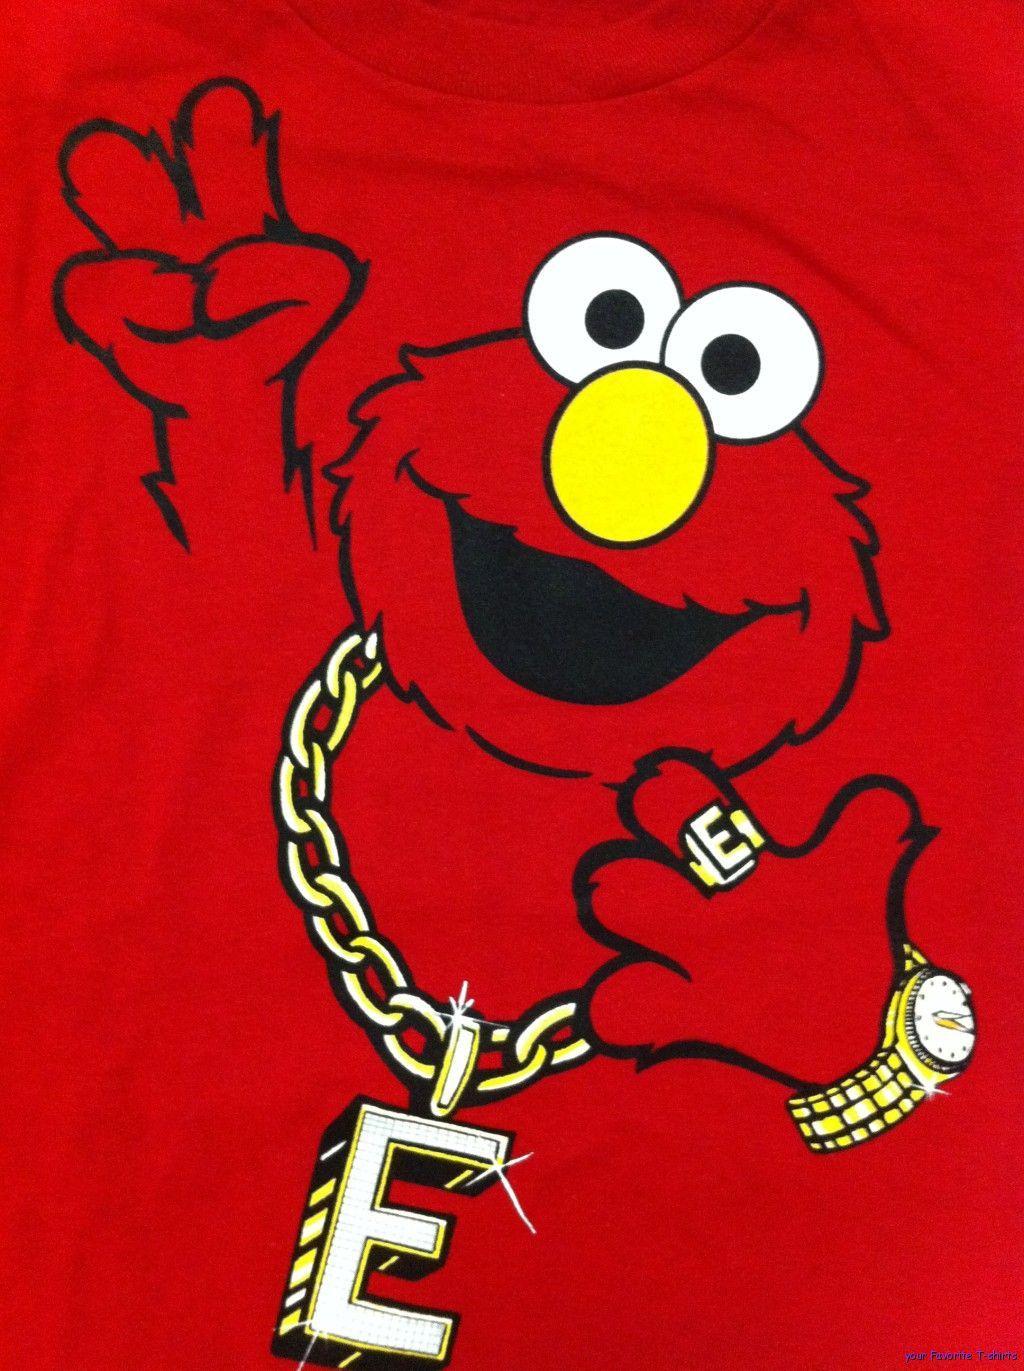 Elmo Wallpaper Iphone 4 Labzada